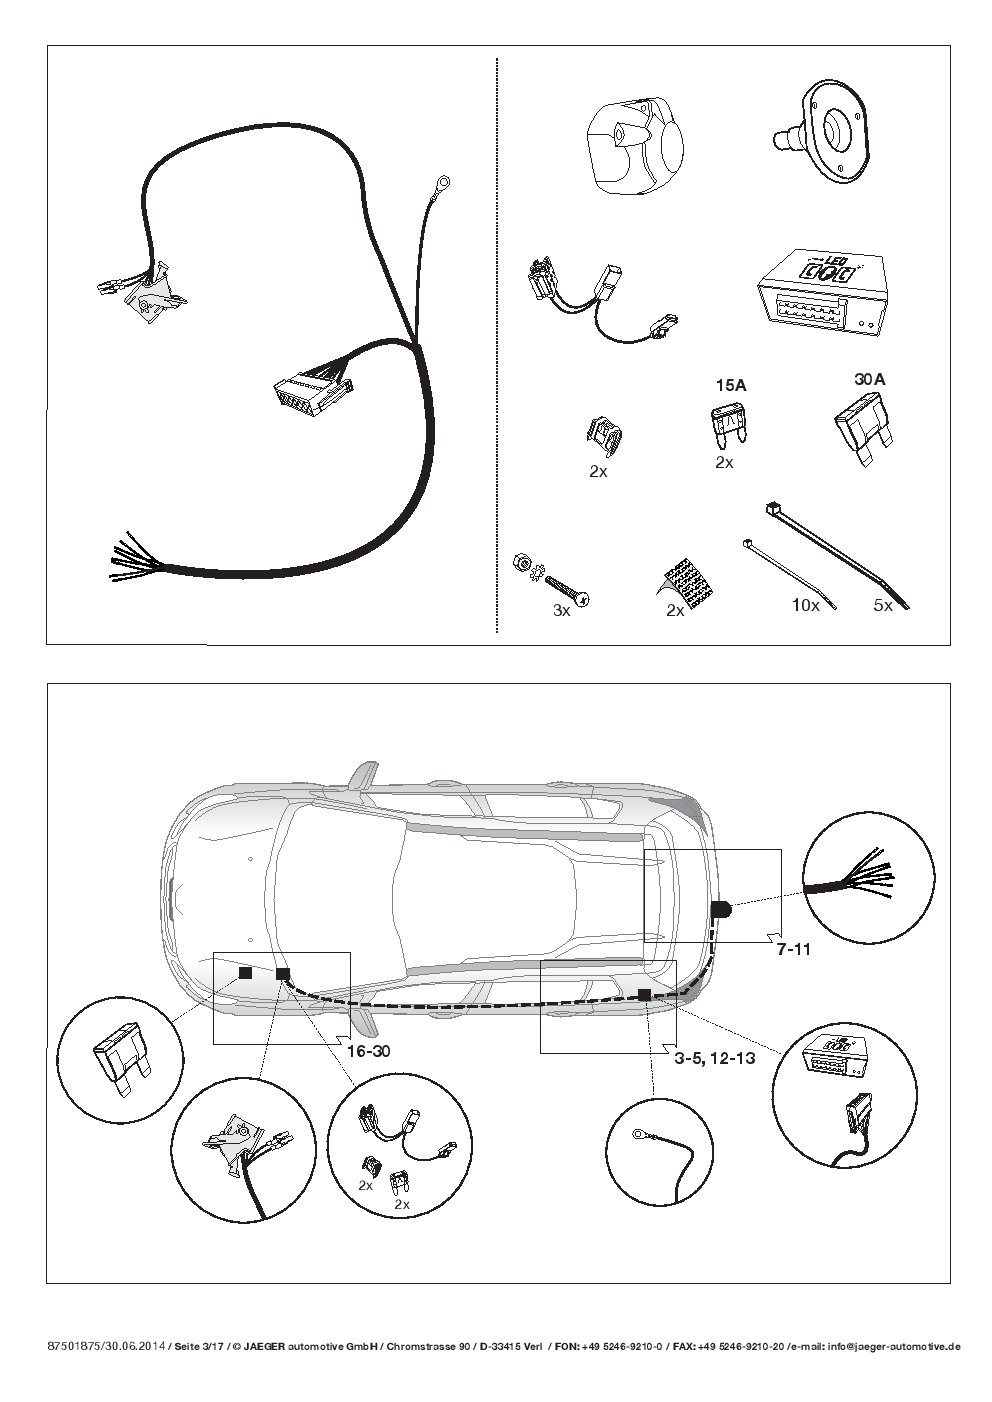 Citroen C4 Towbar Wiring Diagram - wiring diagram circuit-great -  circuit-great.mdcromaovest.it | Citroen C4 Towbar Wiring Diagram |  | mdcromaovest.it